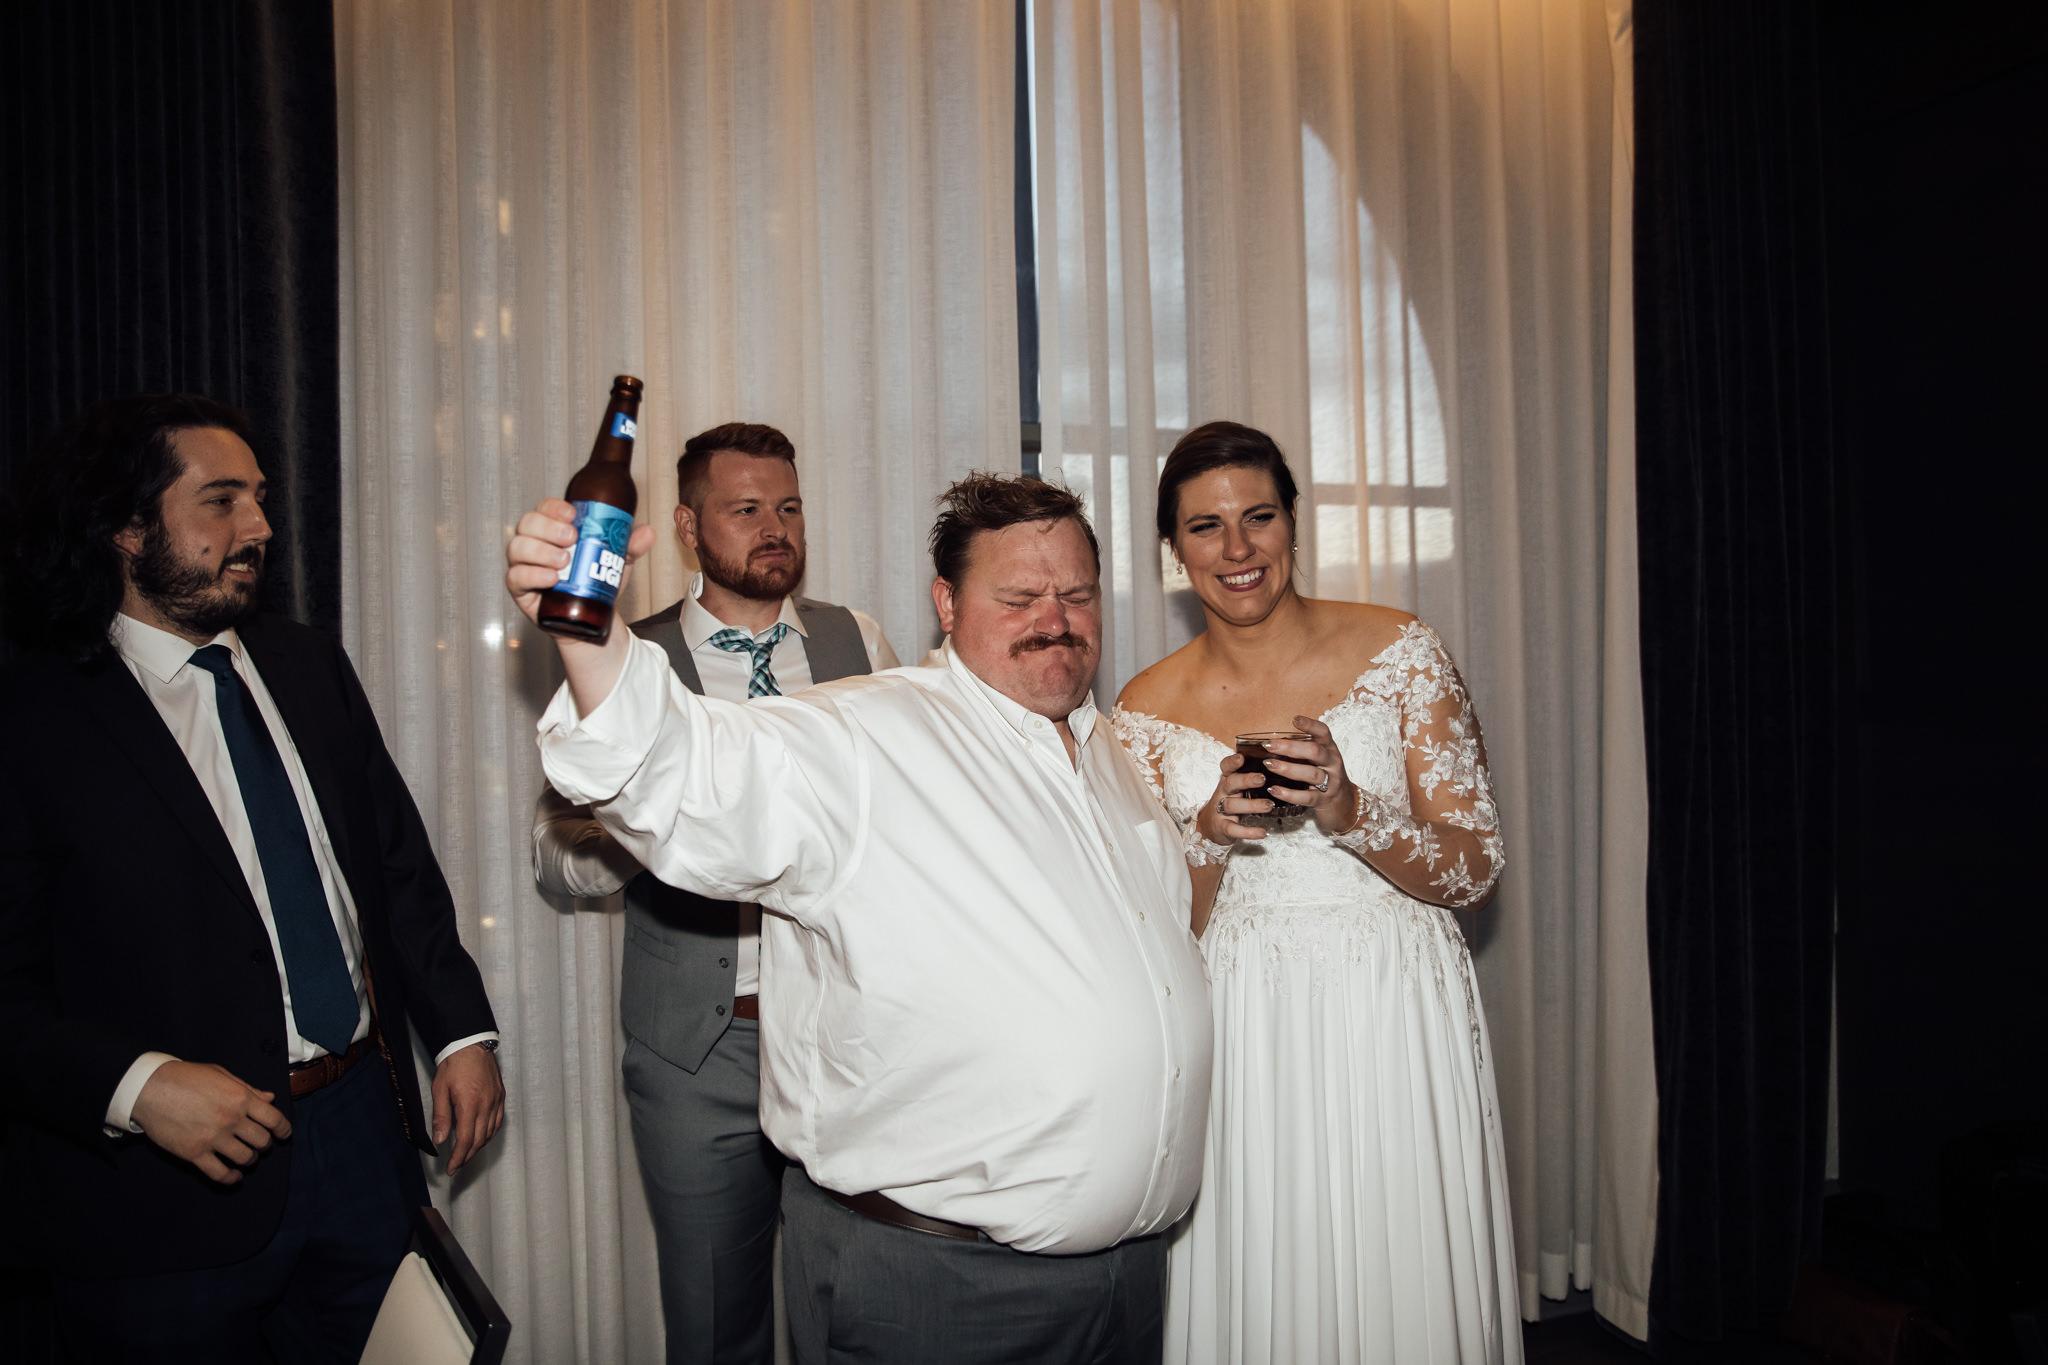 phantom-canyon-brewery-colorado-springs-wedding-photographer-207.jpg